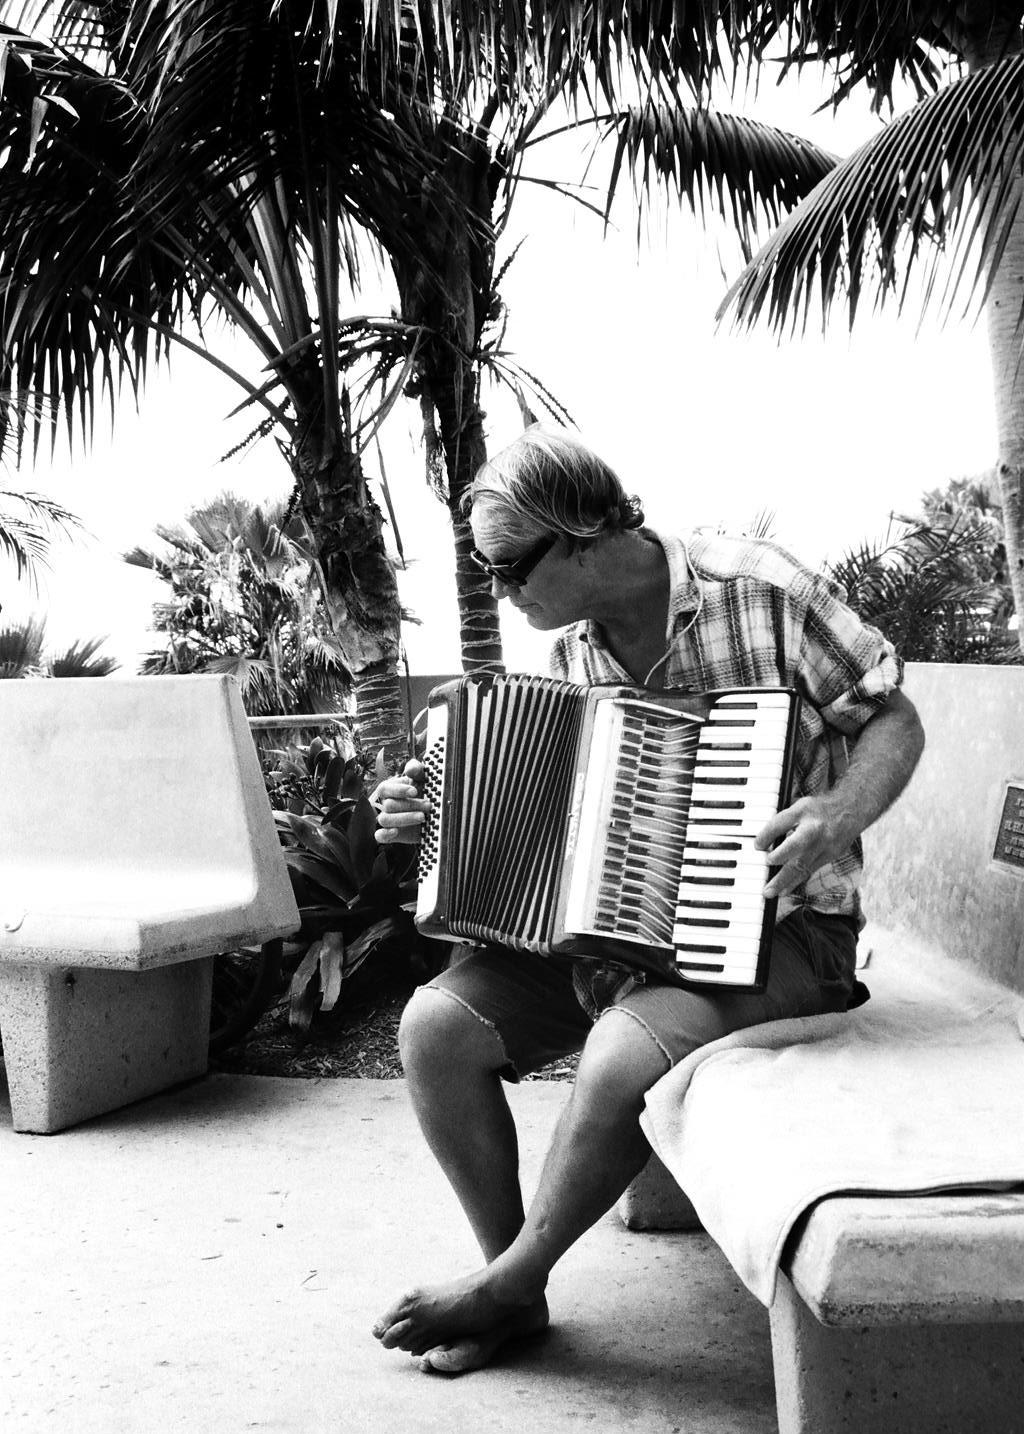 Organette  Nikone FE Eastman 5222  Barbara Murray